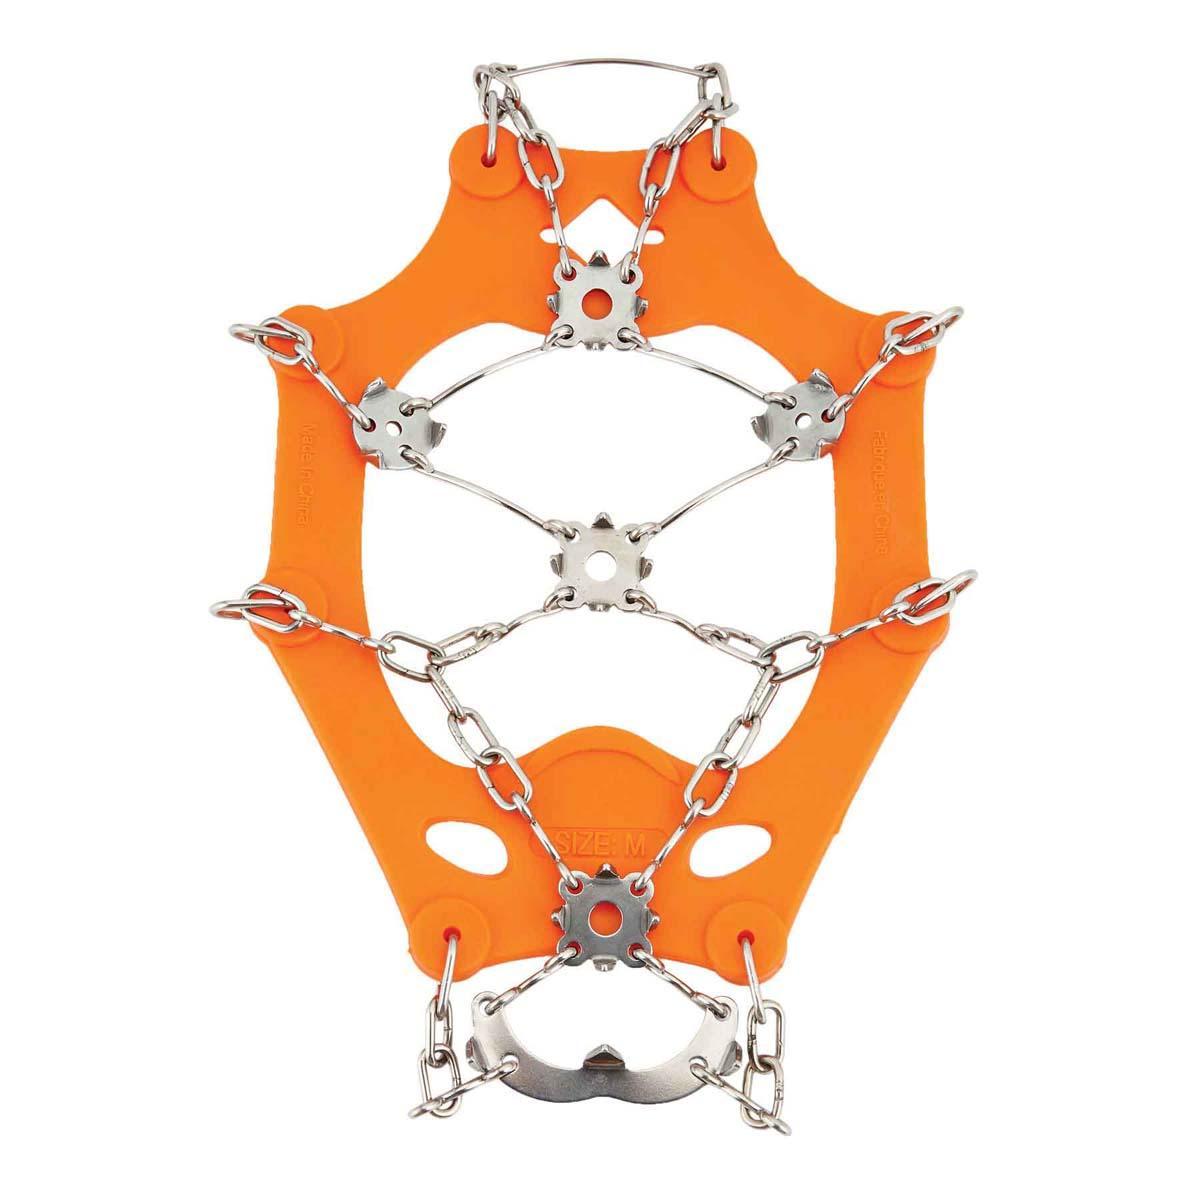 6320 L Orange Aggressive Spike Ice Traction Device